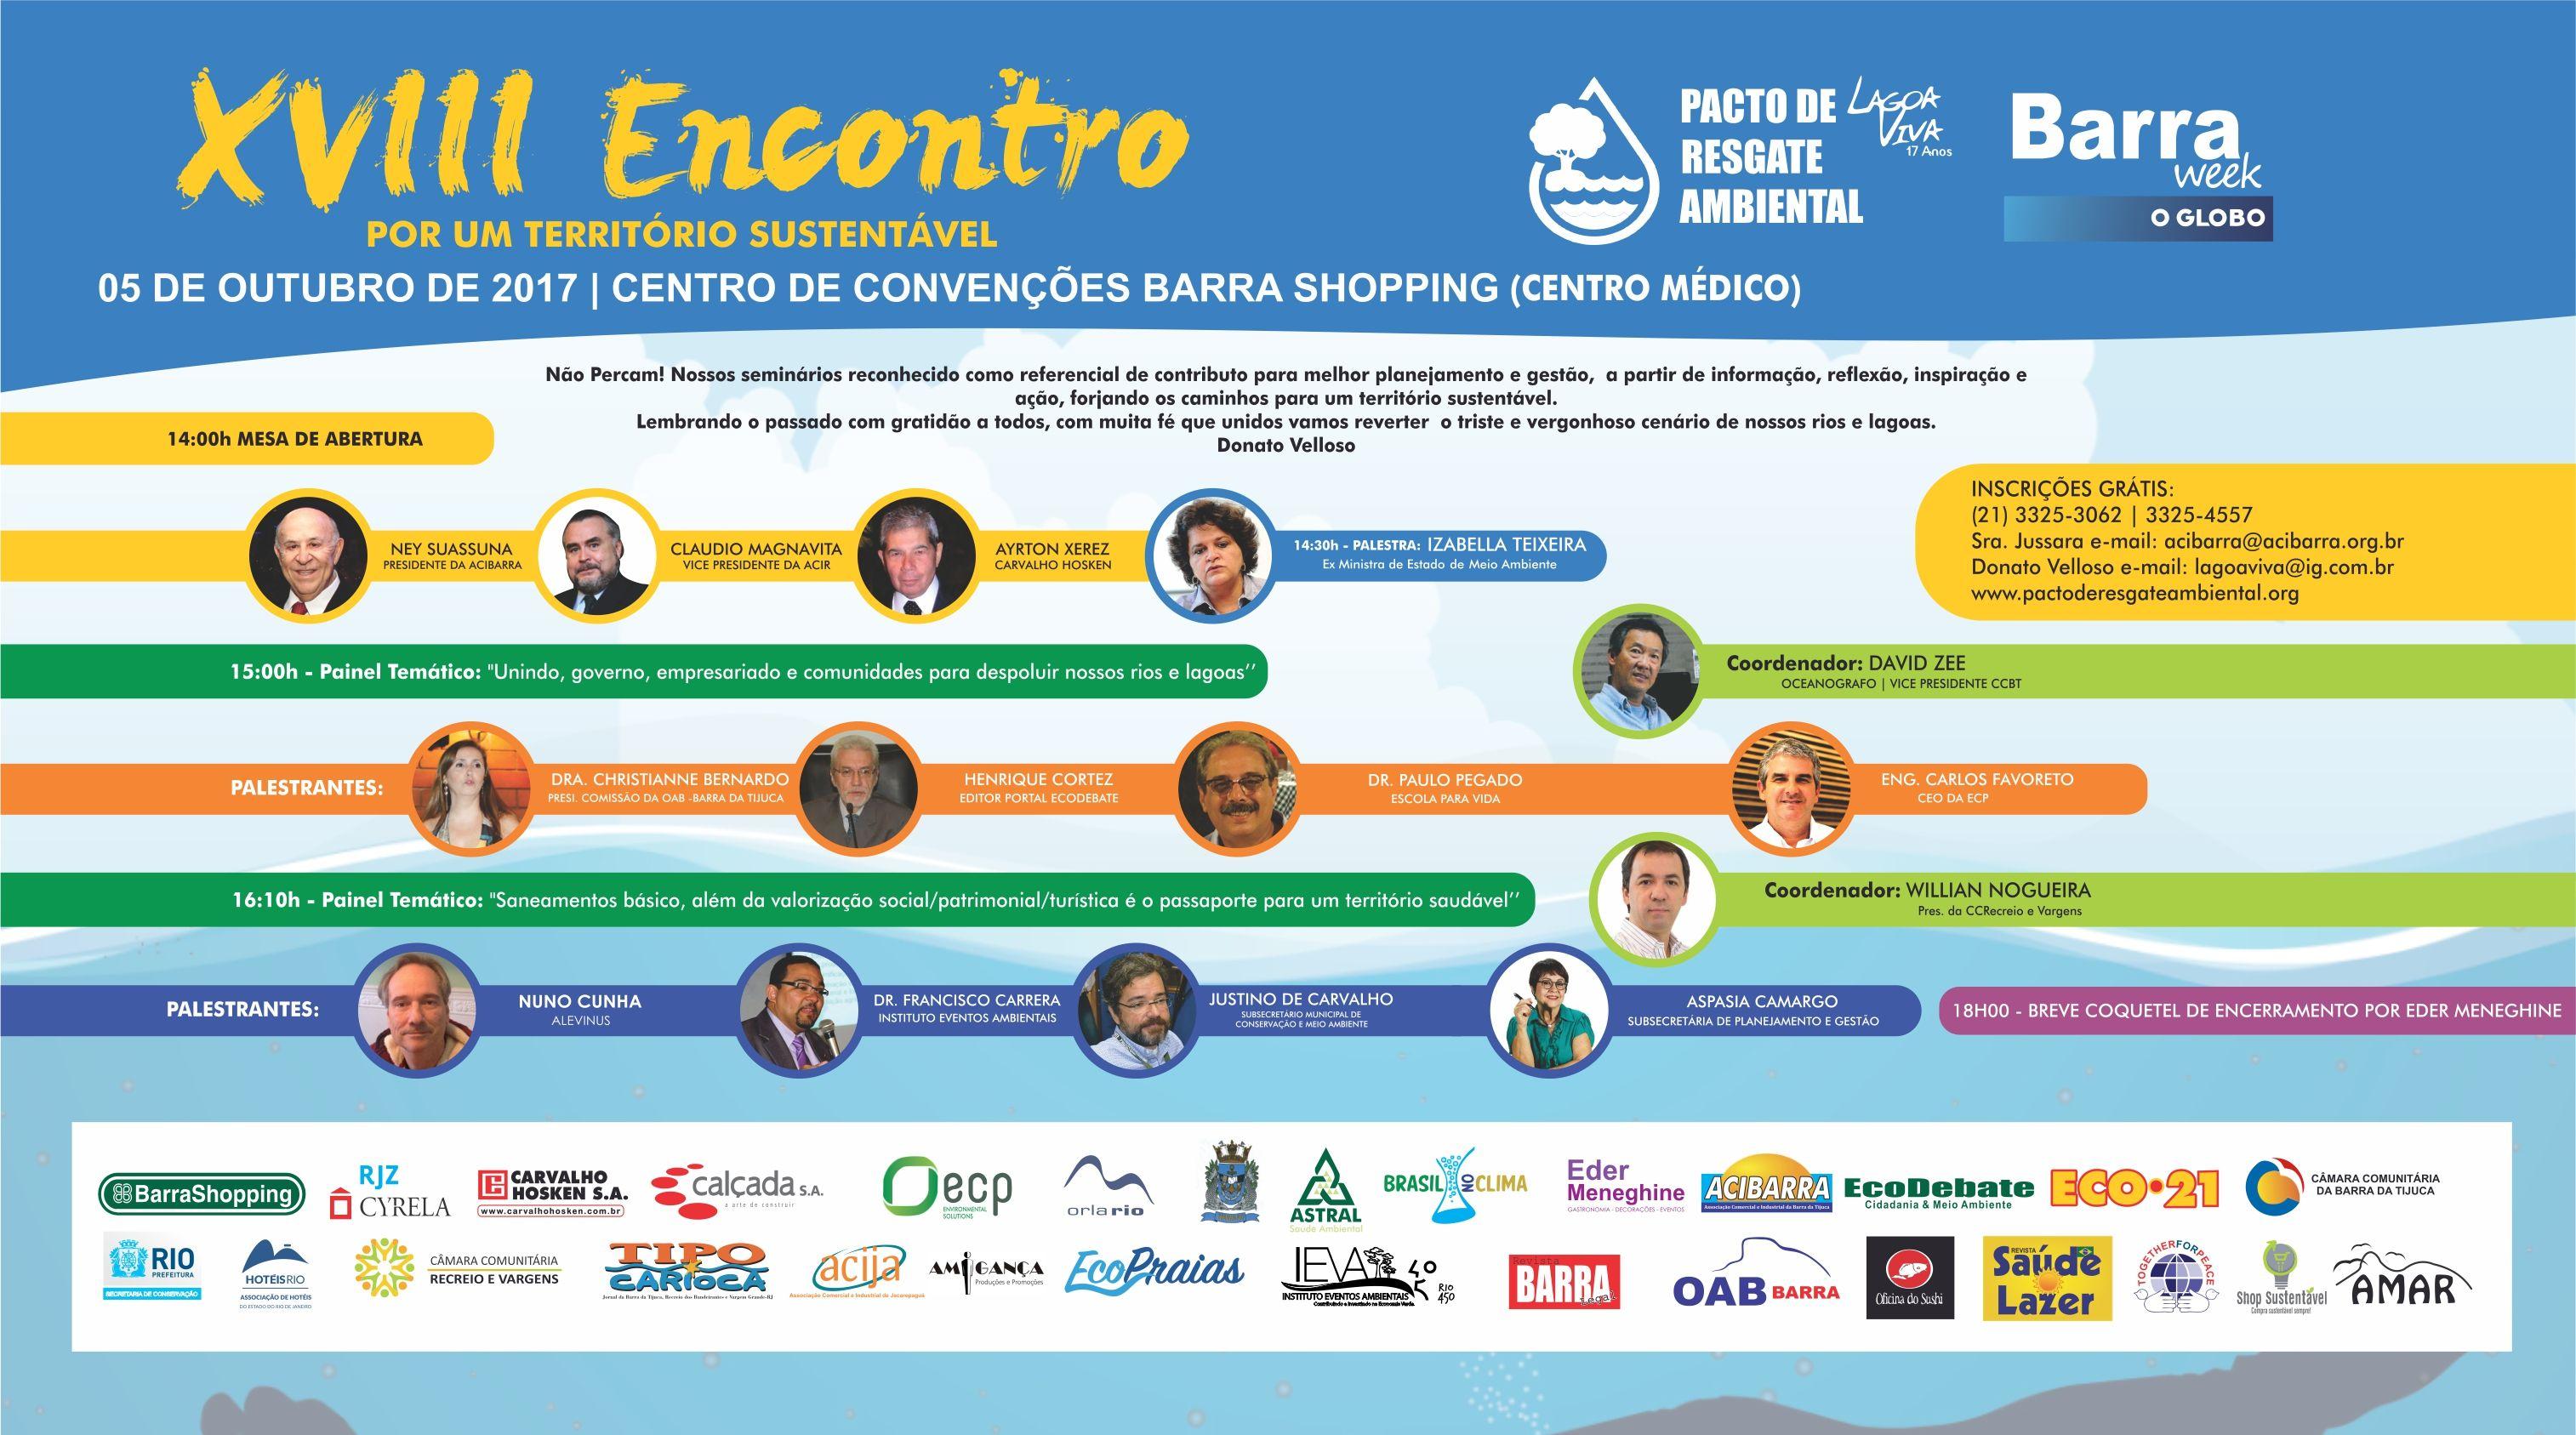 AGENDA: SEMINÁRIO PACTO DE RESGATE AMBIENTAL LOCAL, RJ, 05/10/2019